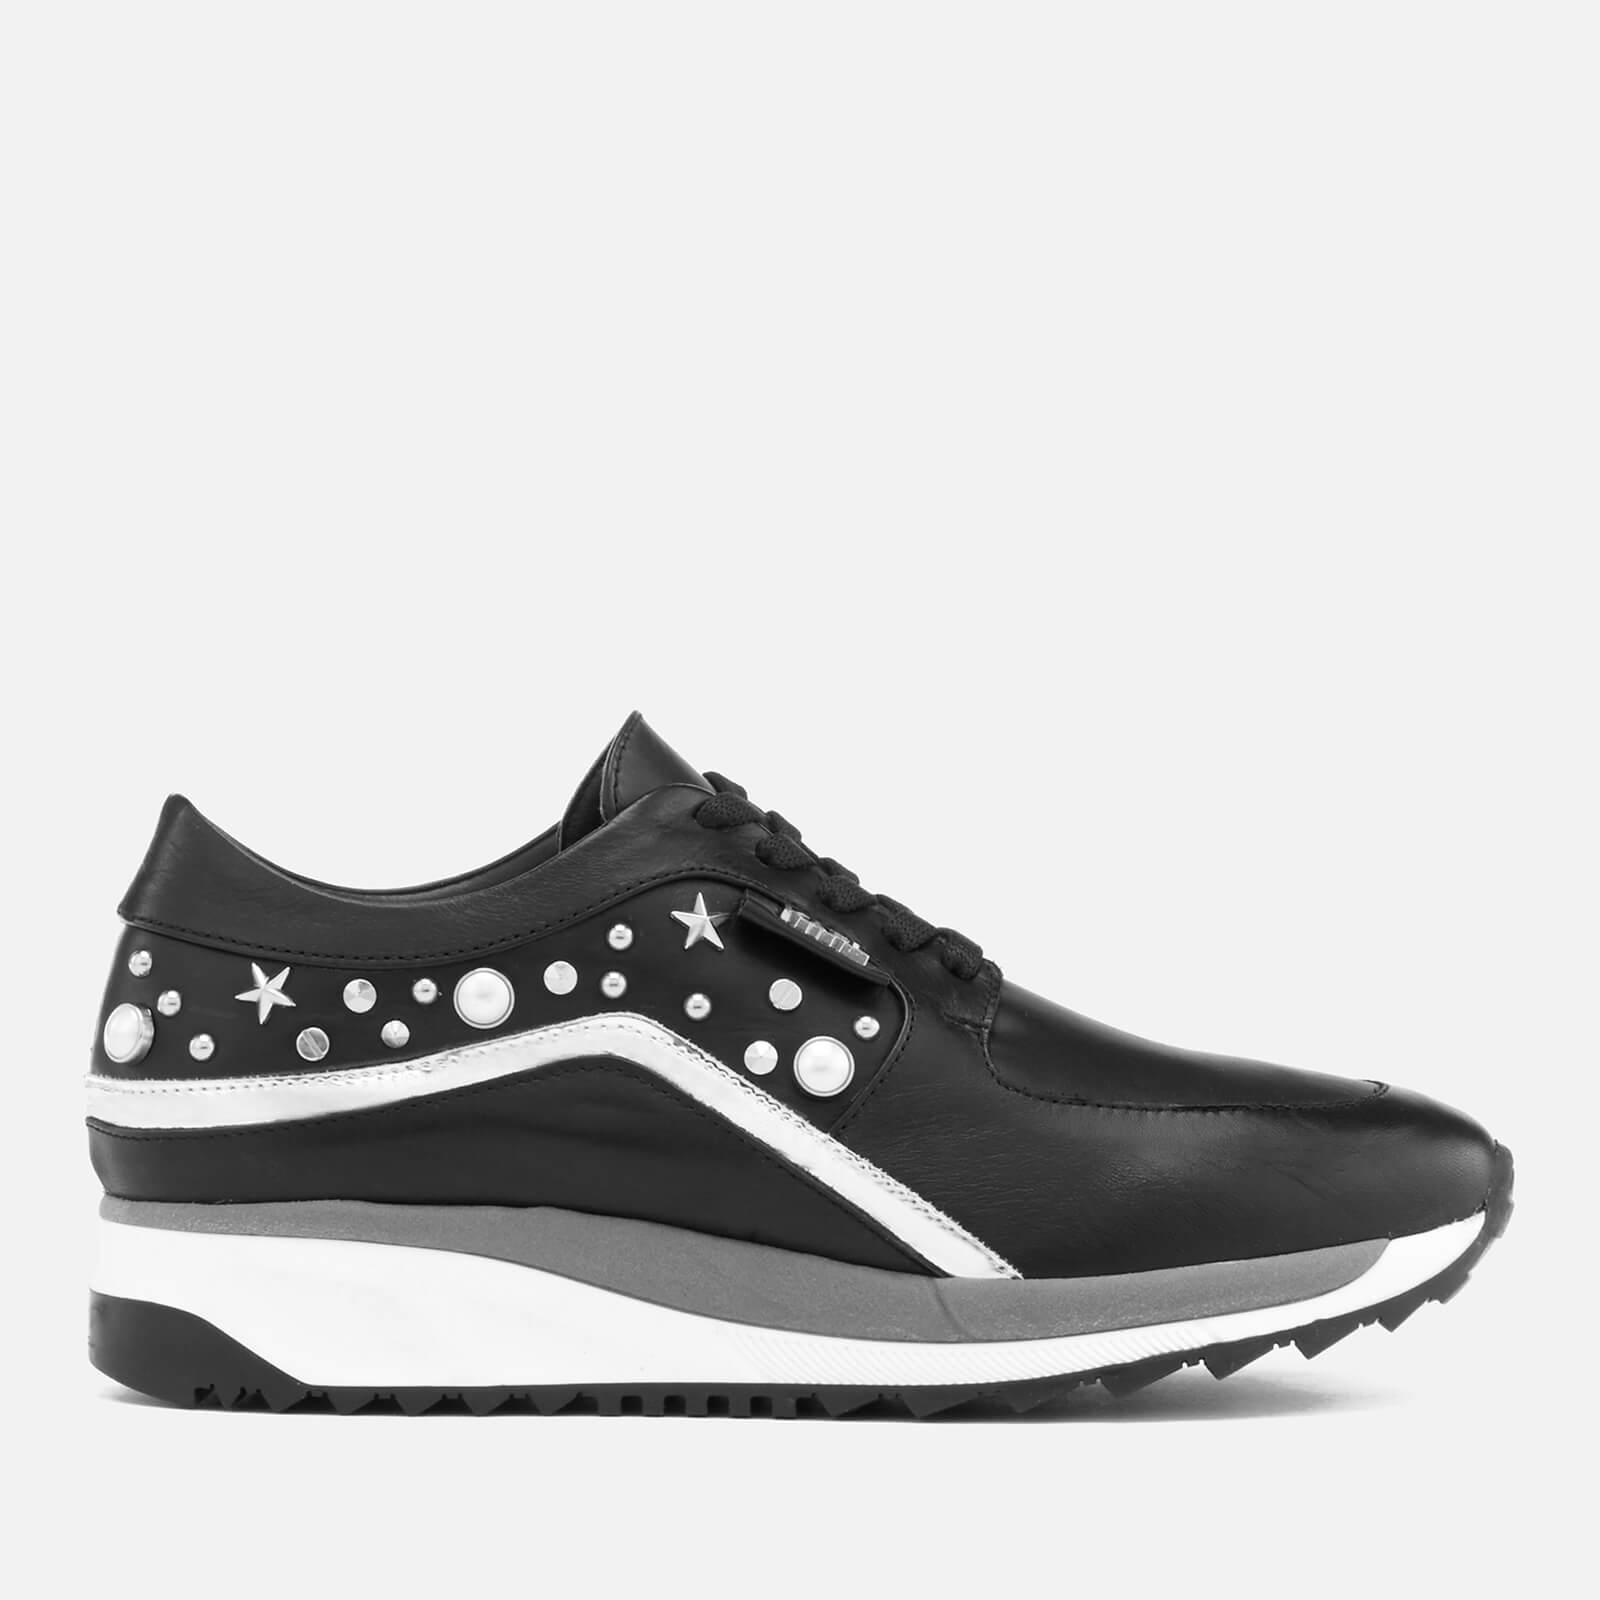 1efbf9cab ... Karl Lagerfeld Women s Vivace Leather Celestia Mix Runner Trainers -  Black